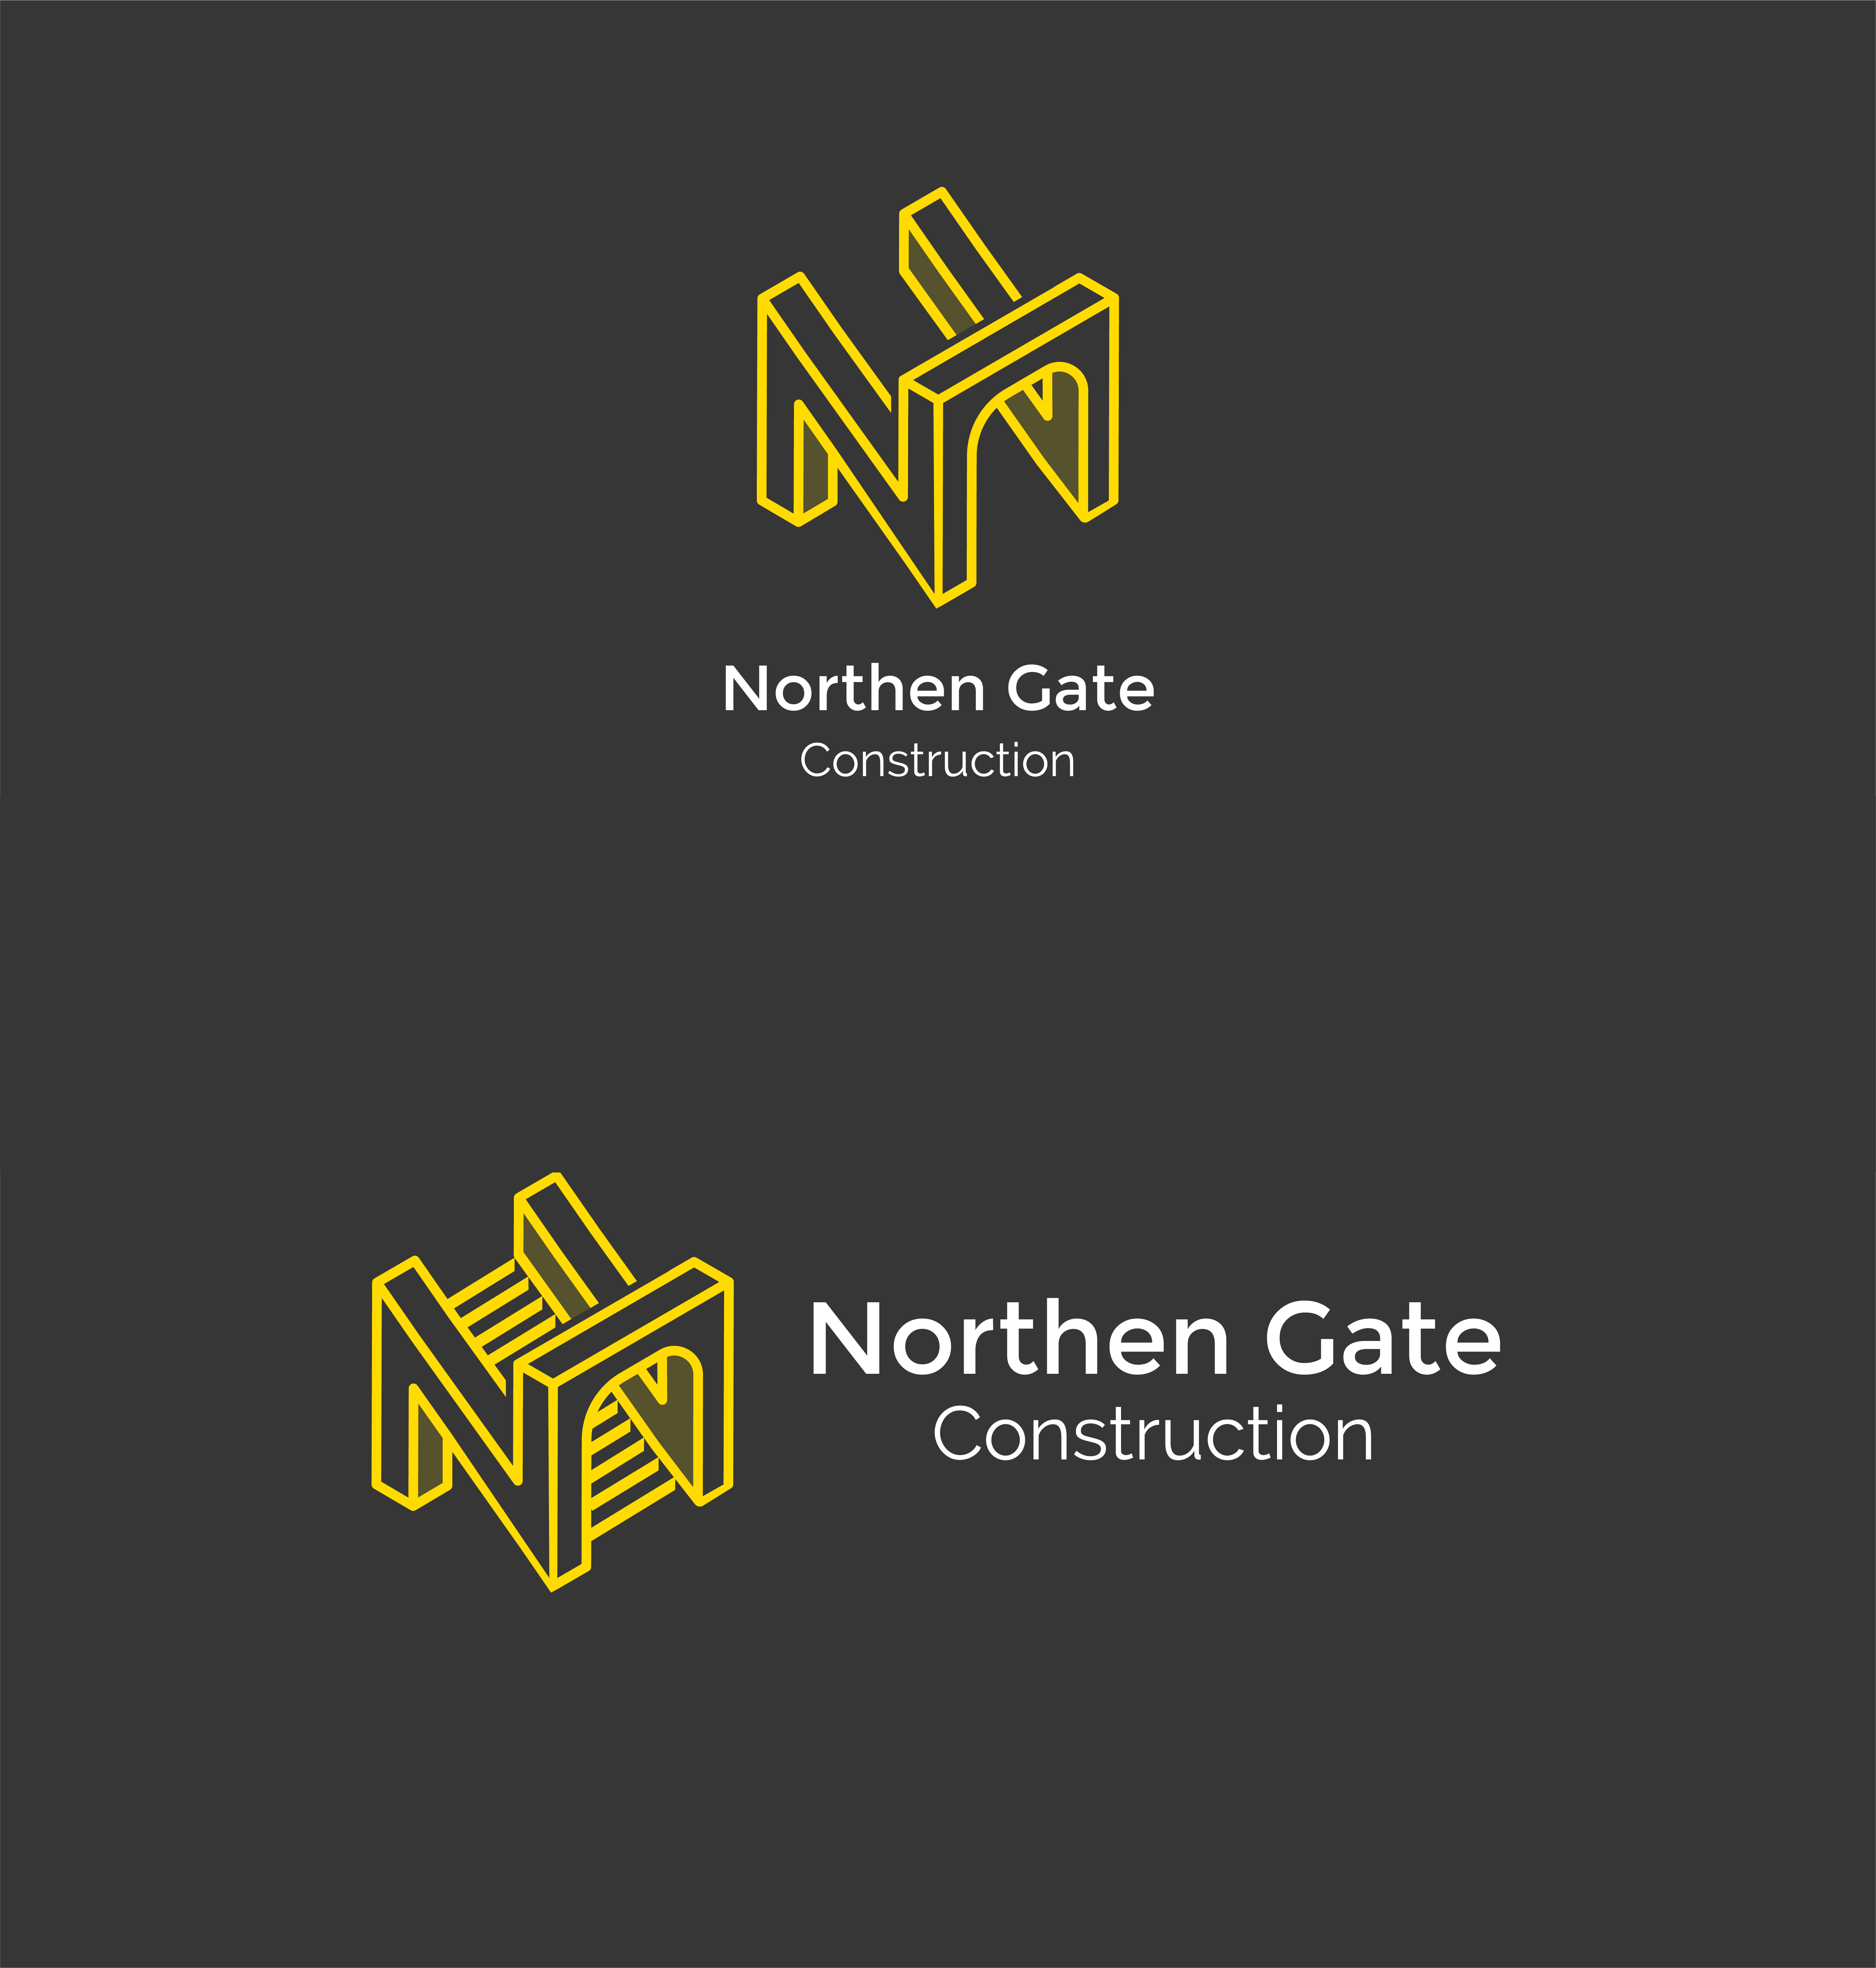 Letter N - Construction Gate Bridge Logo Logo Template example image 11